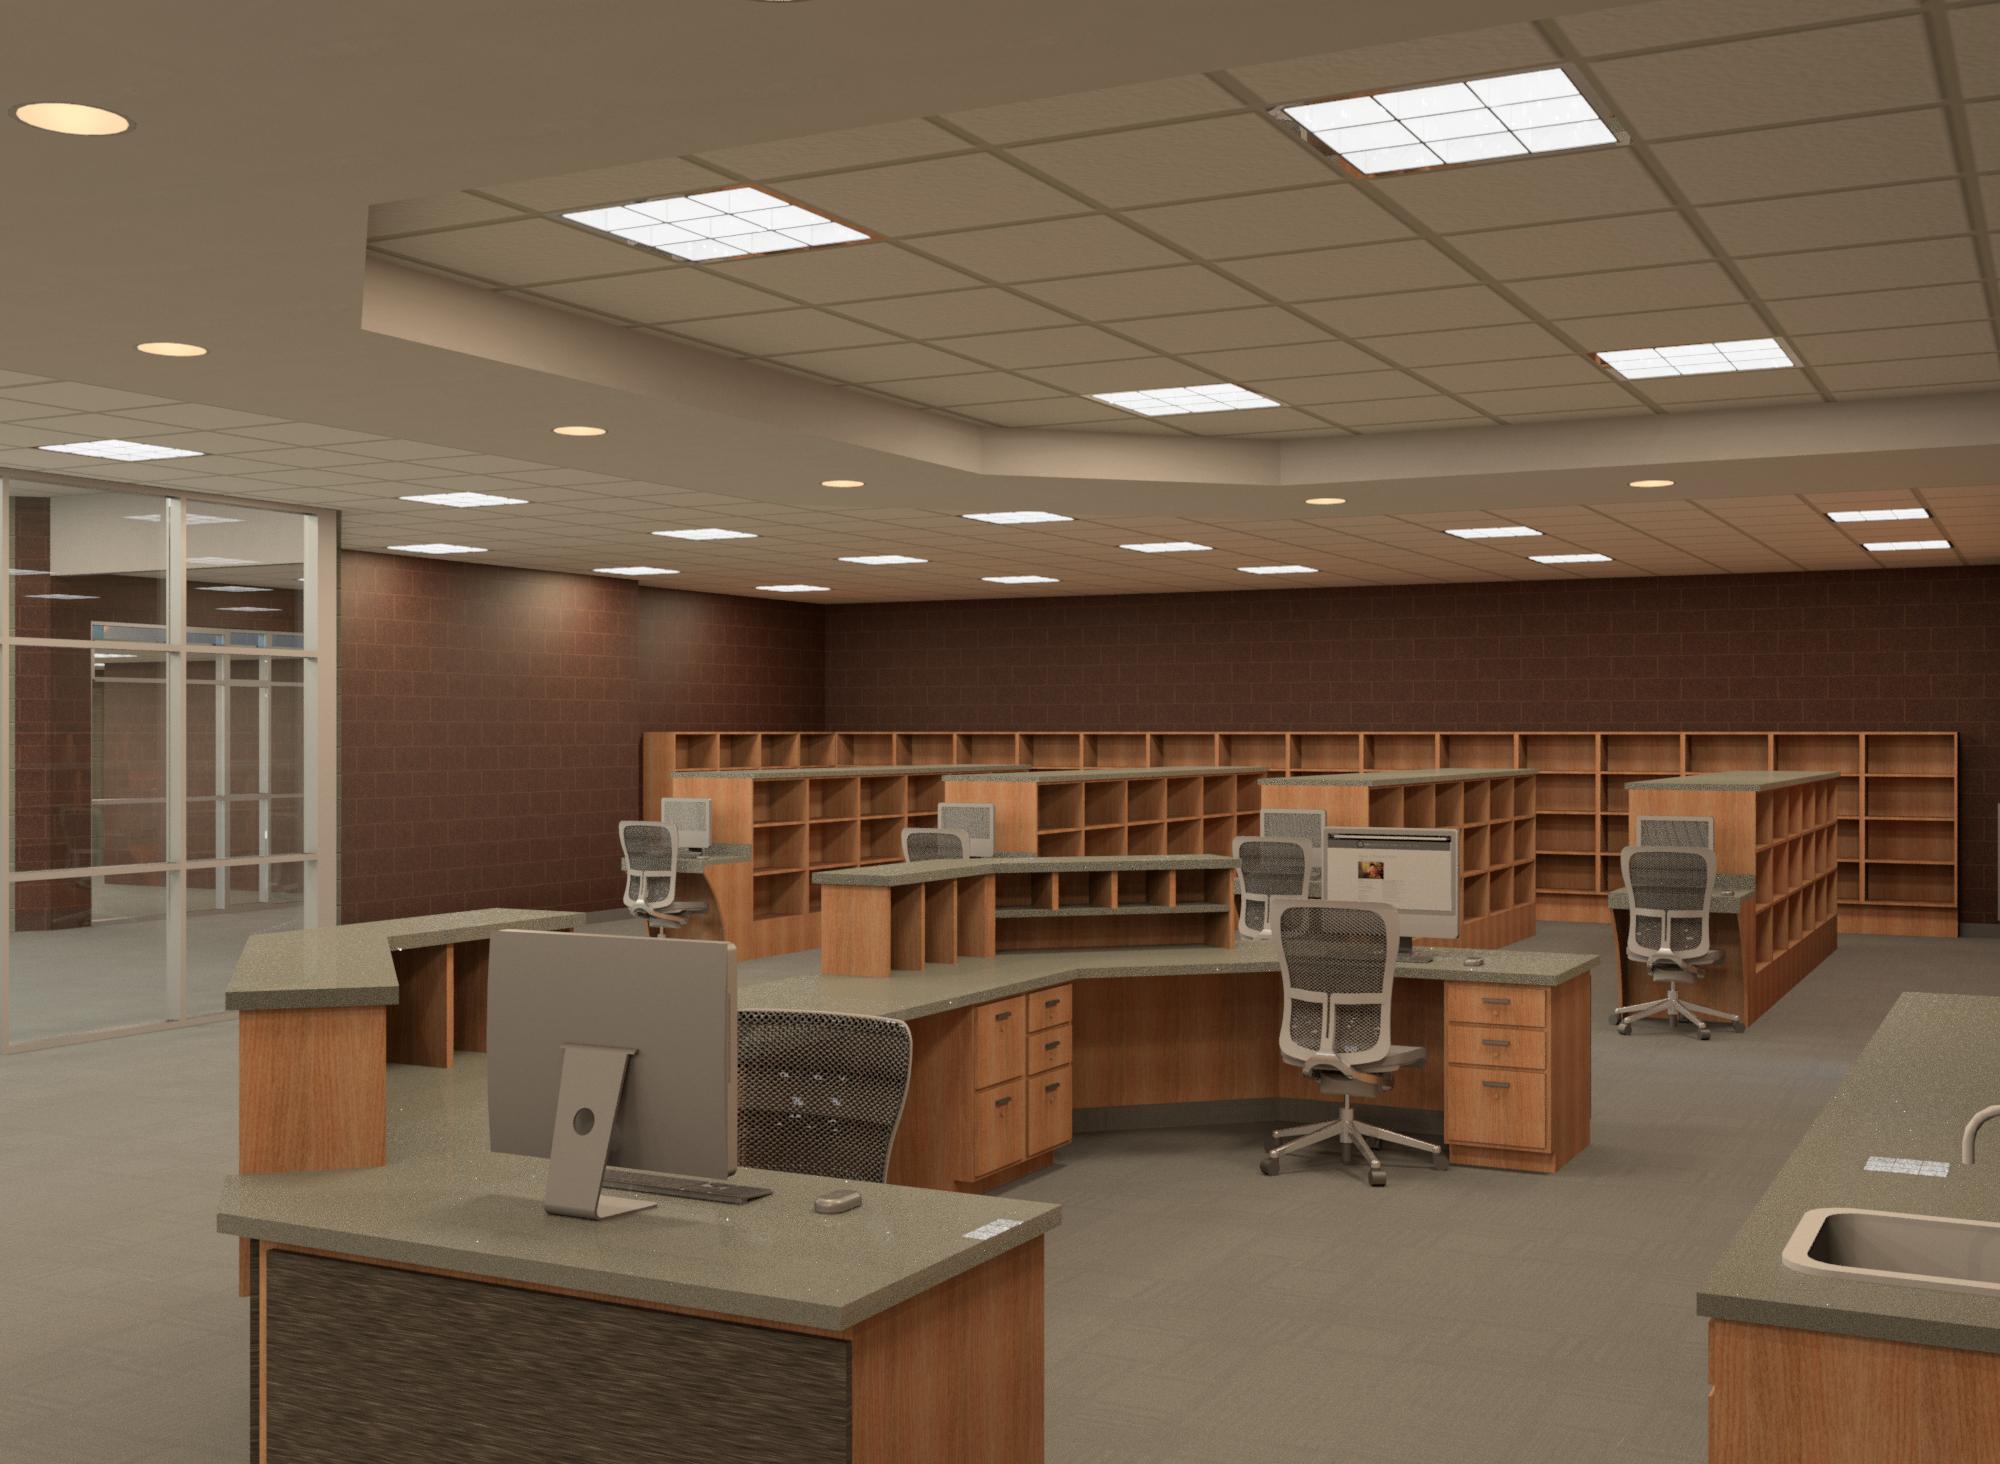 Cascade Elementary School